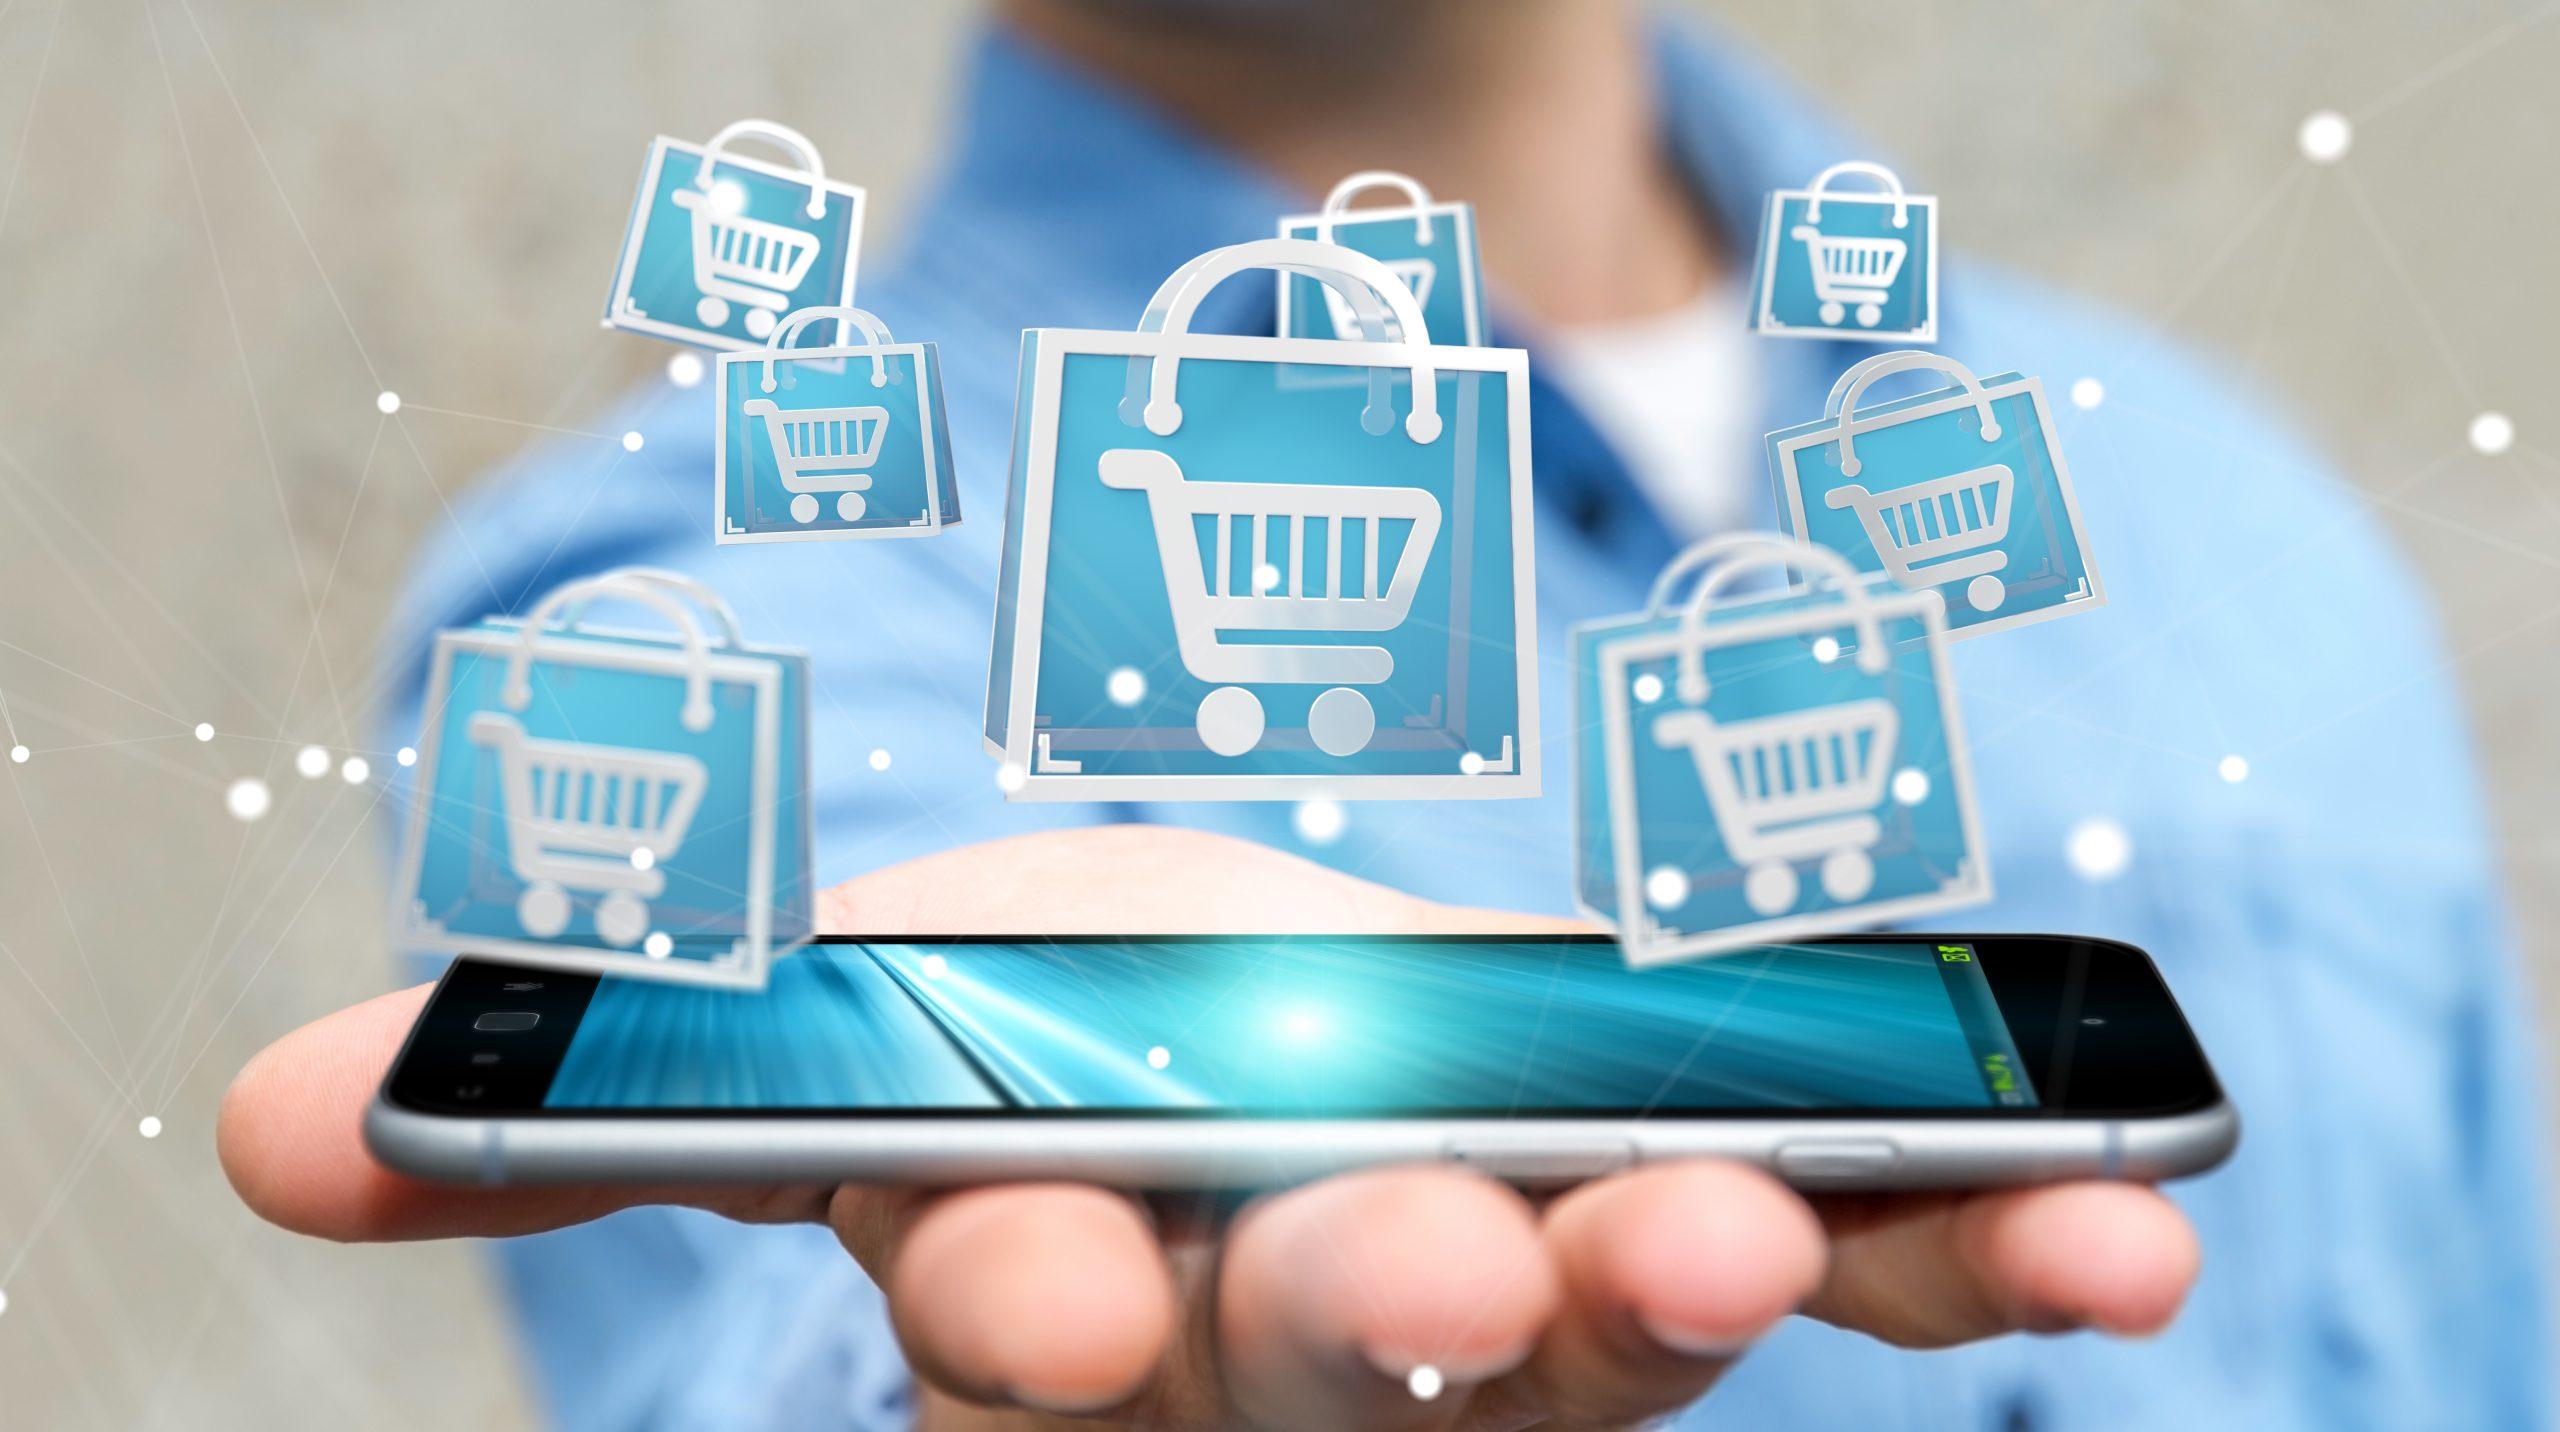 Pasos para un comercio electrónico exitoso en 2020